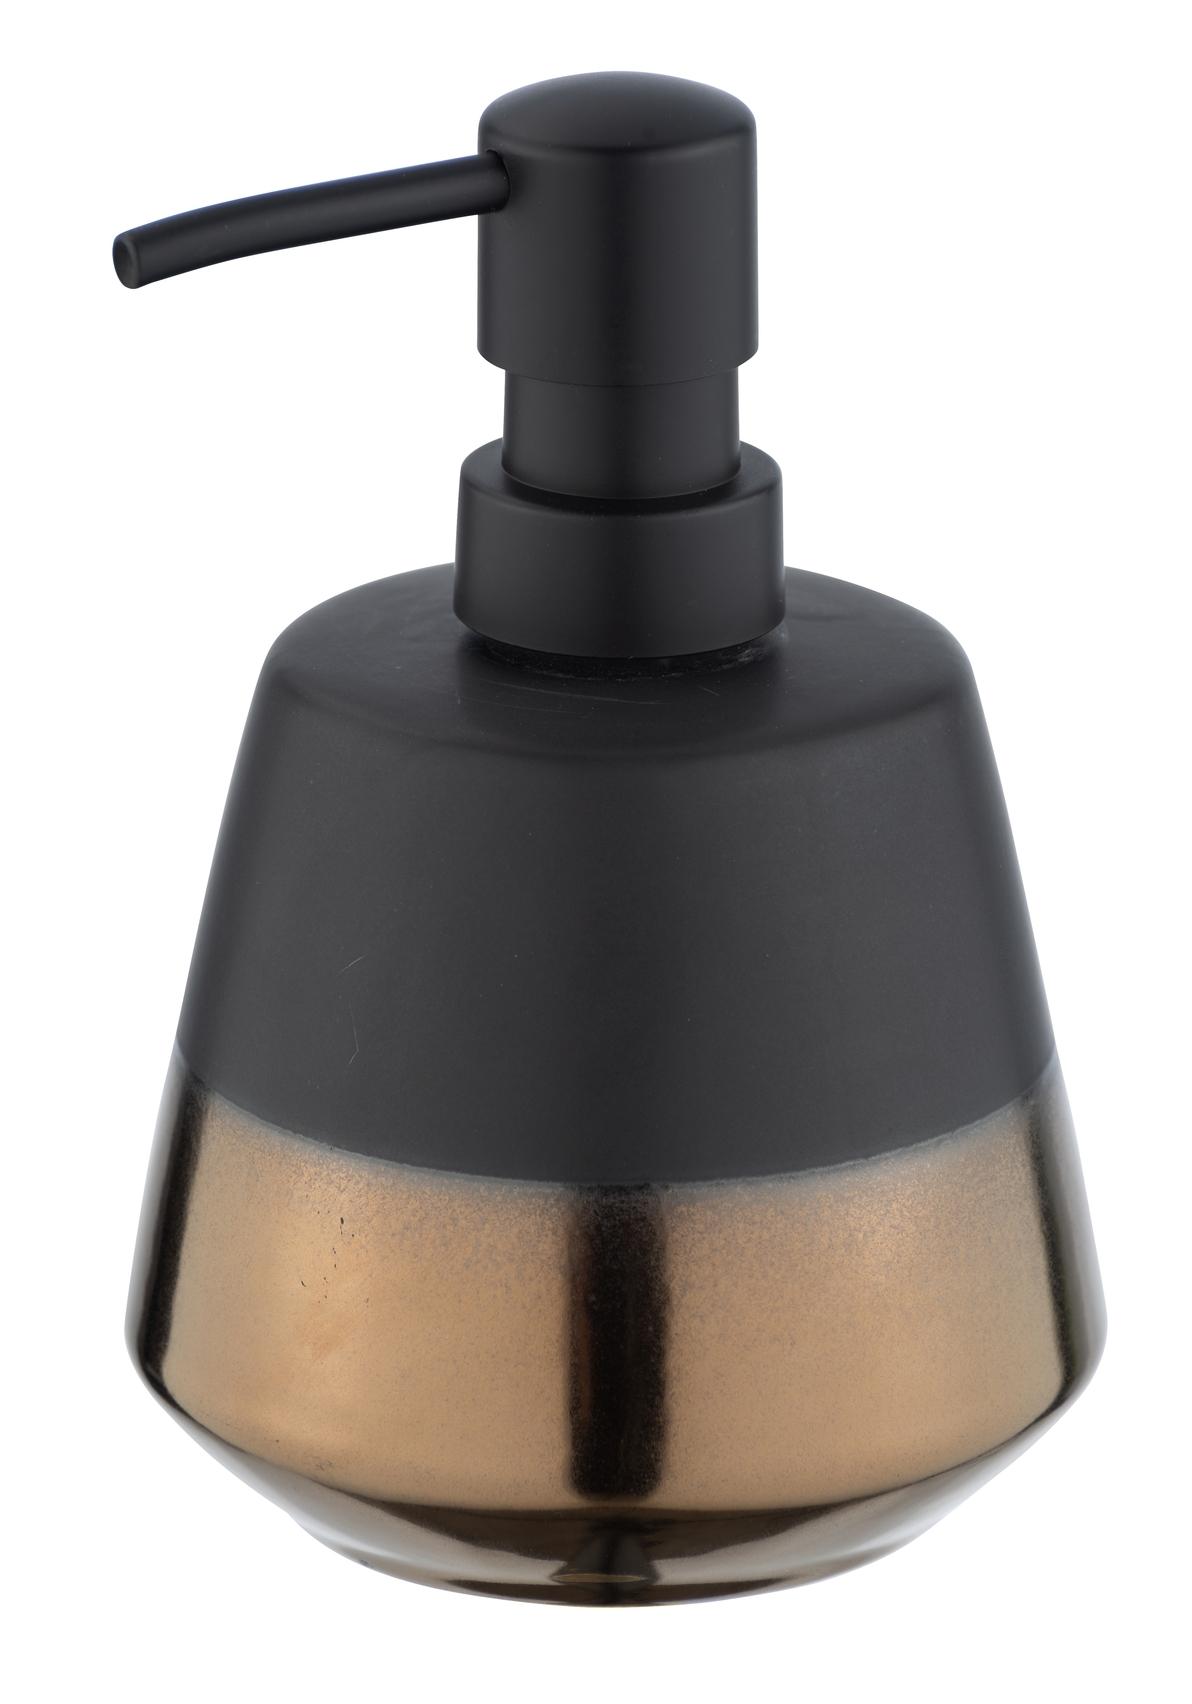 Dozator pentru sapun, din ceramica, Brandol Negru / Auriu, Ø9,8xH14,1 cm imagine